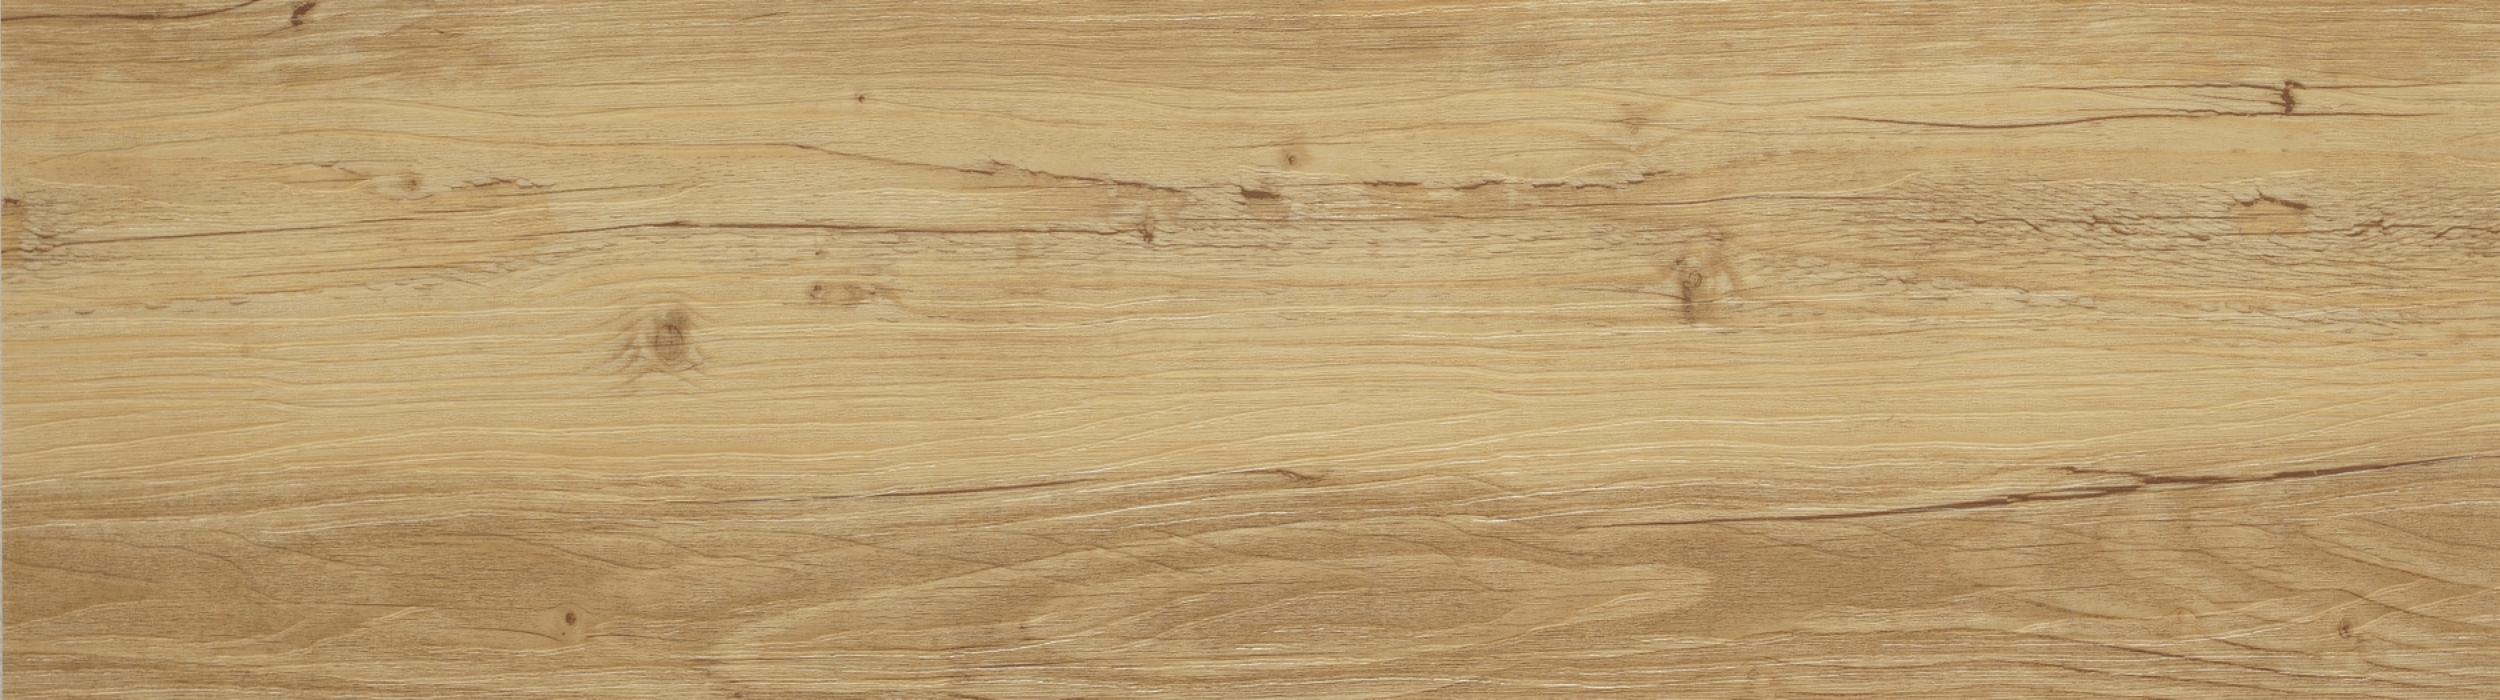 details zu adramaq tanne antikwei 1801 vinyl laminat 3 32 m. Black Bedroom Furniture Sets. Home Design Ideas